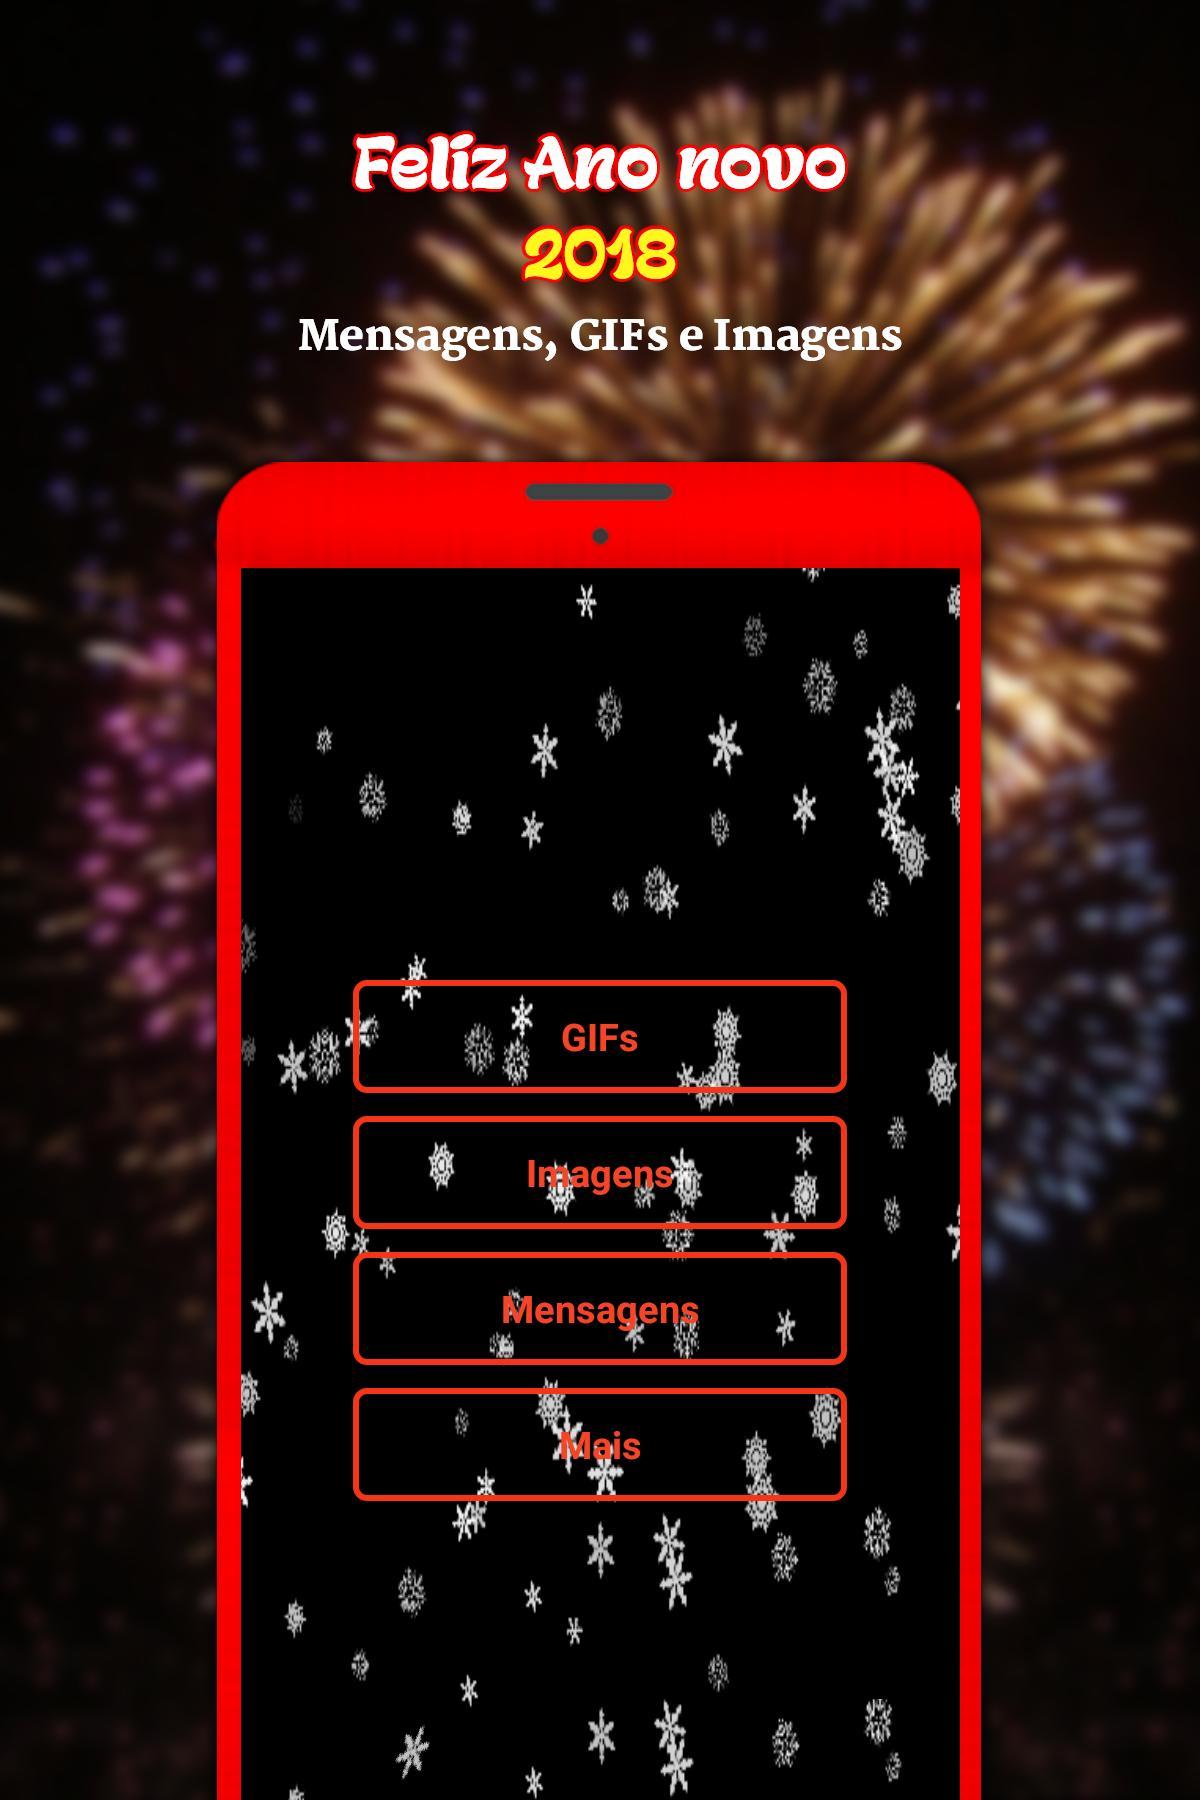 Gif De Ano Novo 2020 For Android Apk Download